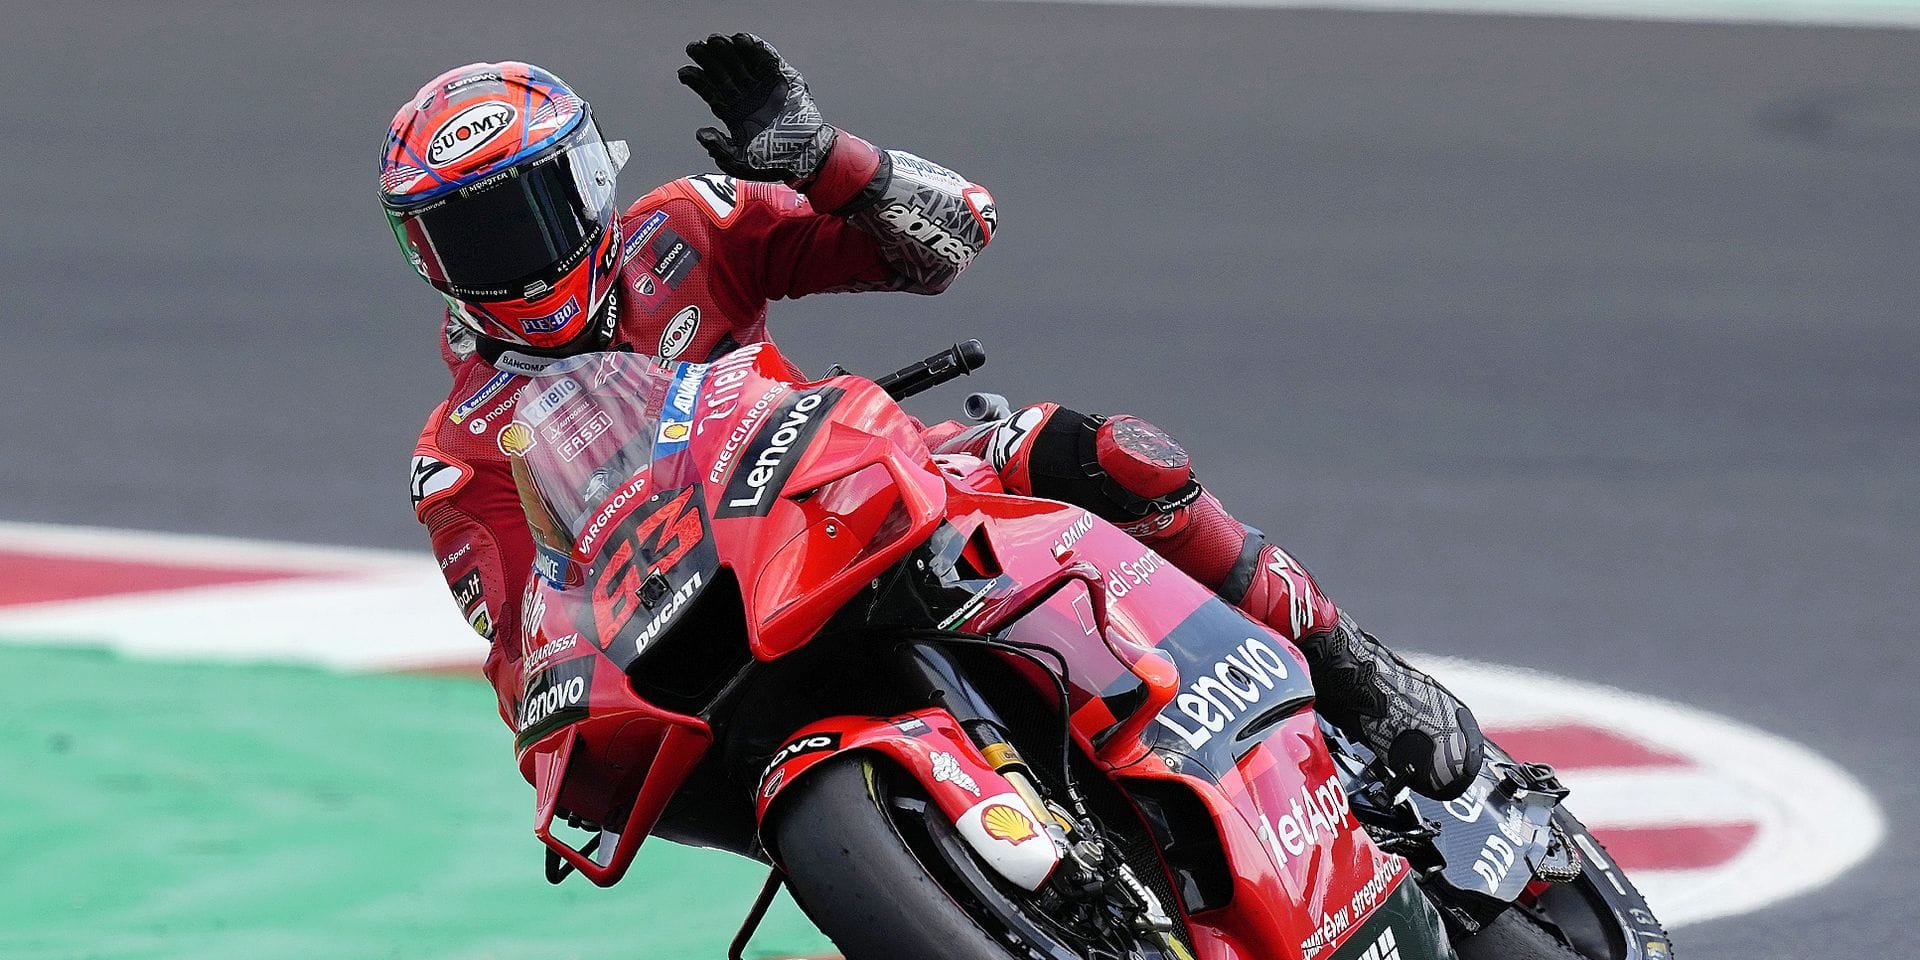 Moto GP: Francesco Bagnaia sur un nuage en Aragon